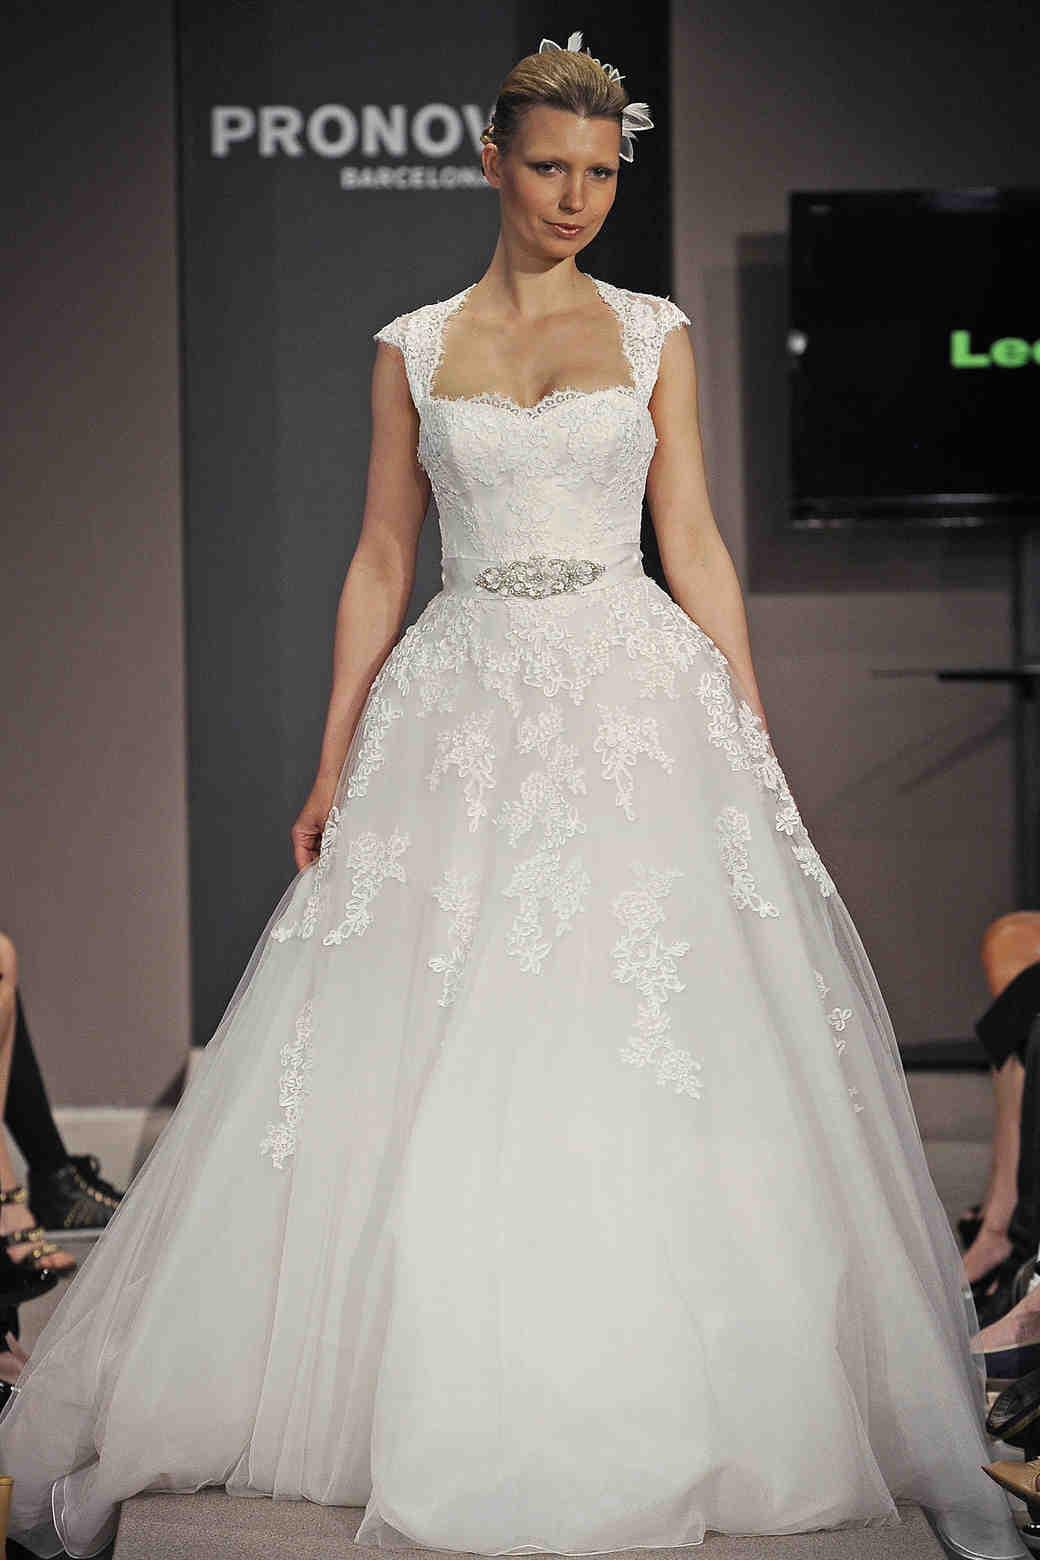 cap sleeve wedding dresses spring cap sleeve wedding dress Ladylike Lace The lace cap sleeves